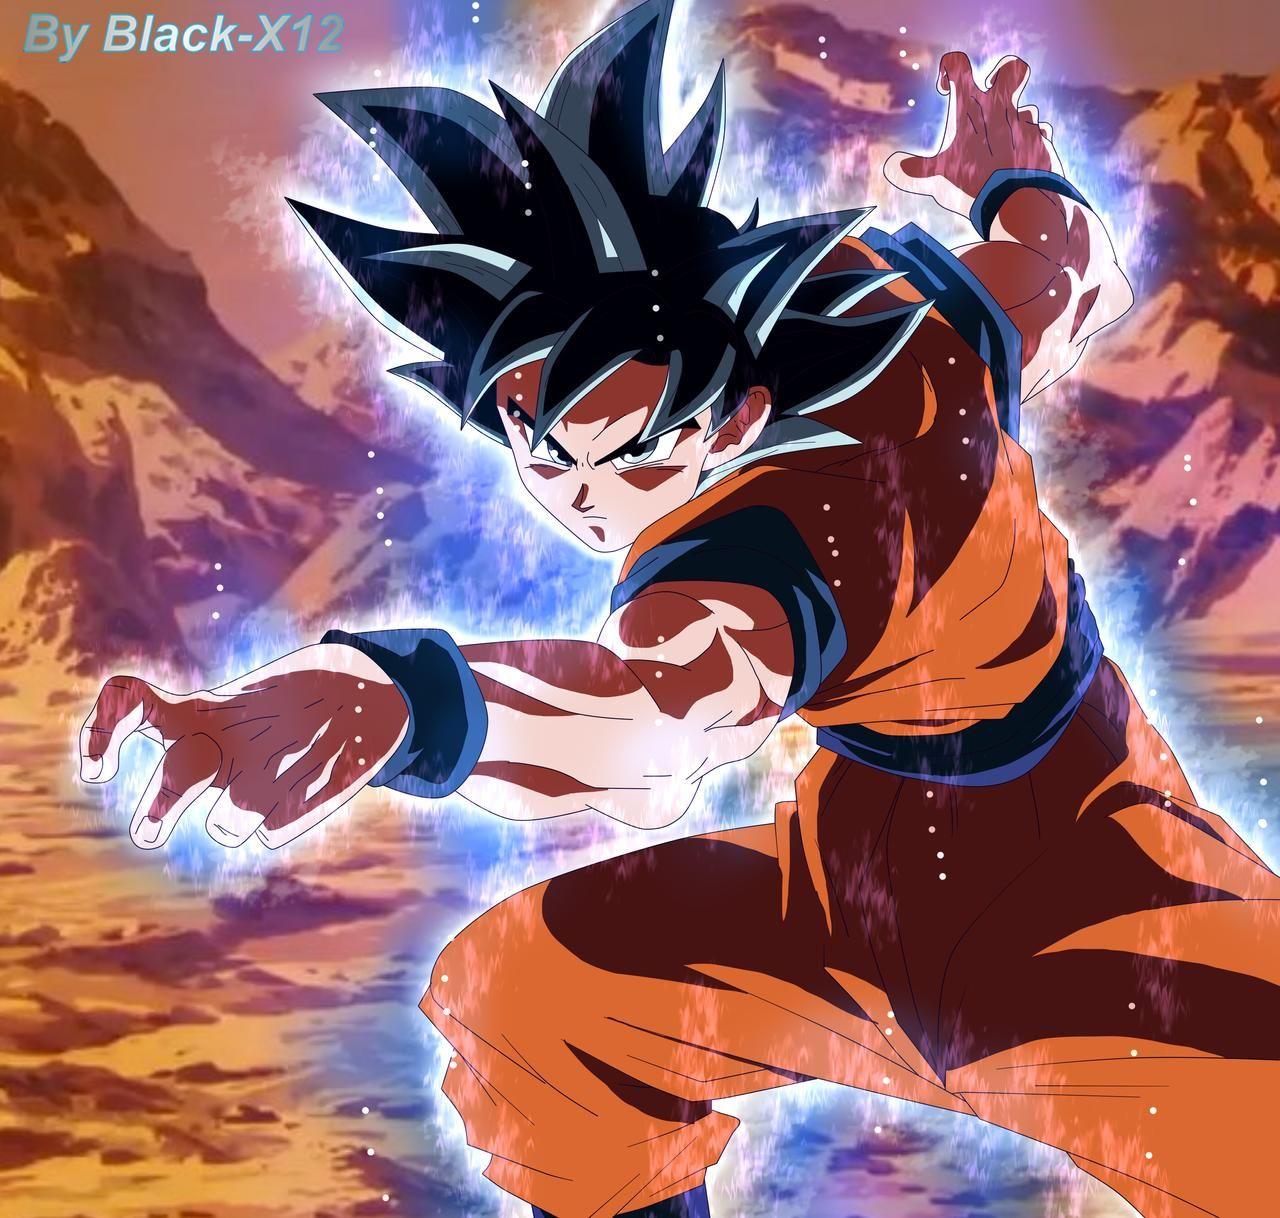 Goku Ultra Instinct Anime Coloring By Black X12 On Deviantart Dragon Ball Wallpaper Iphone Anime Dragon Ball Super Dragon Ball Image